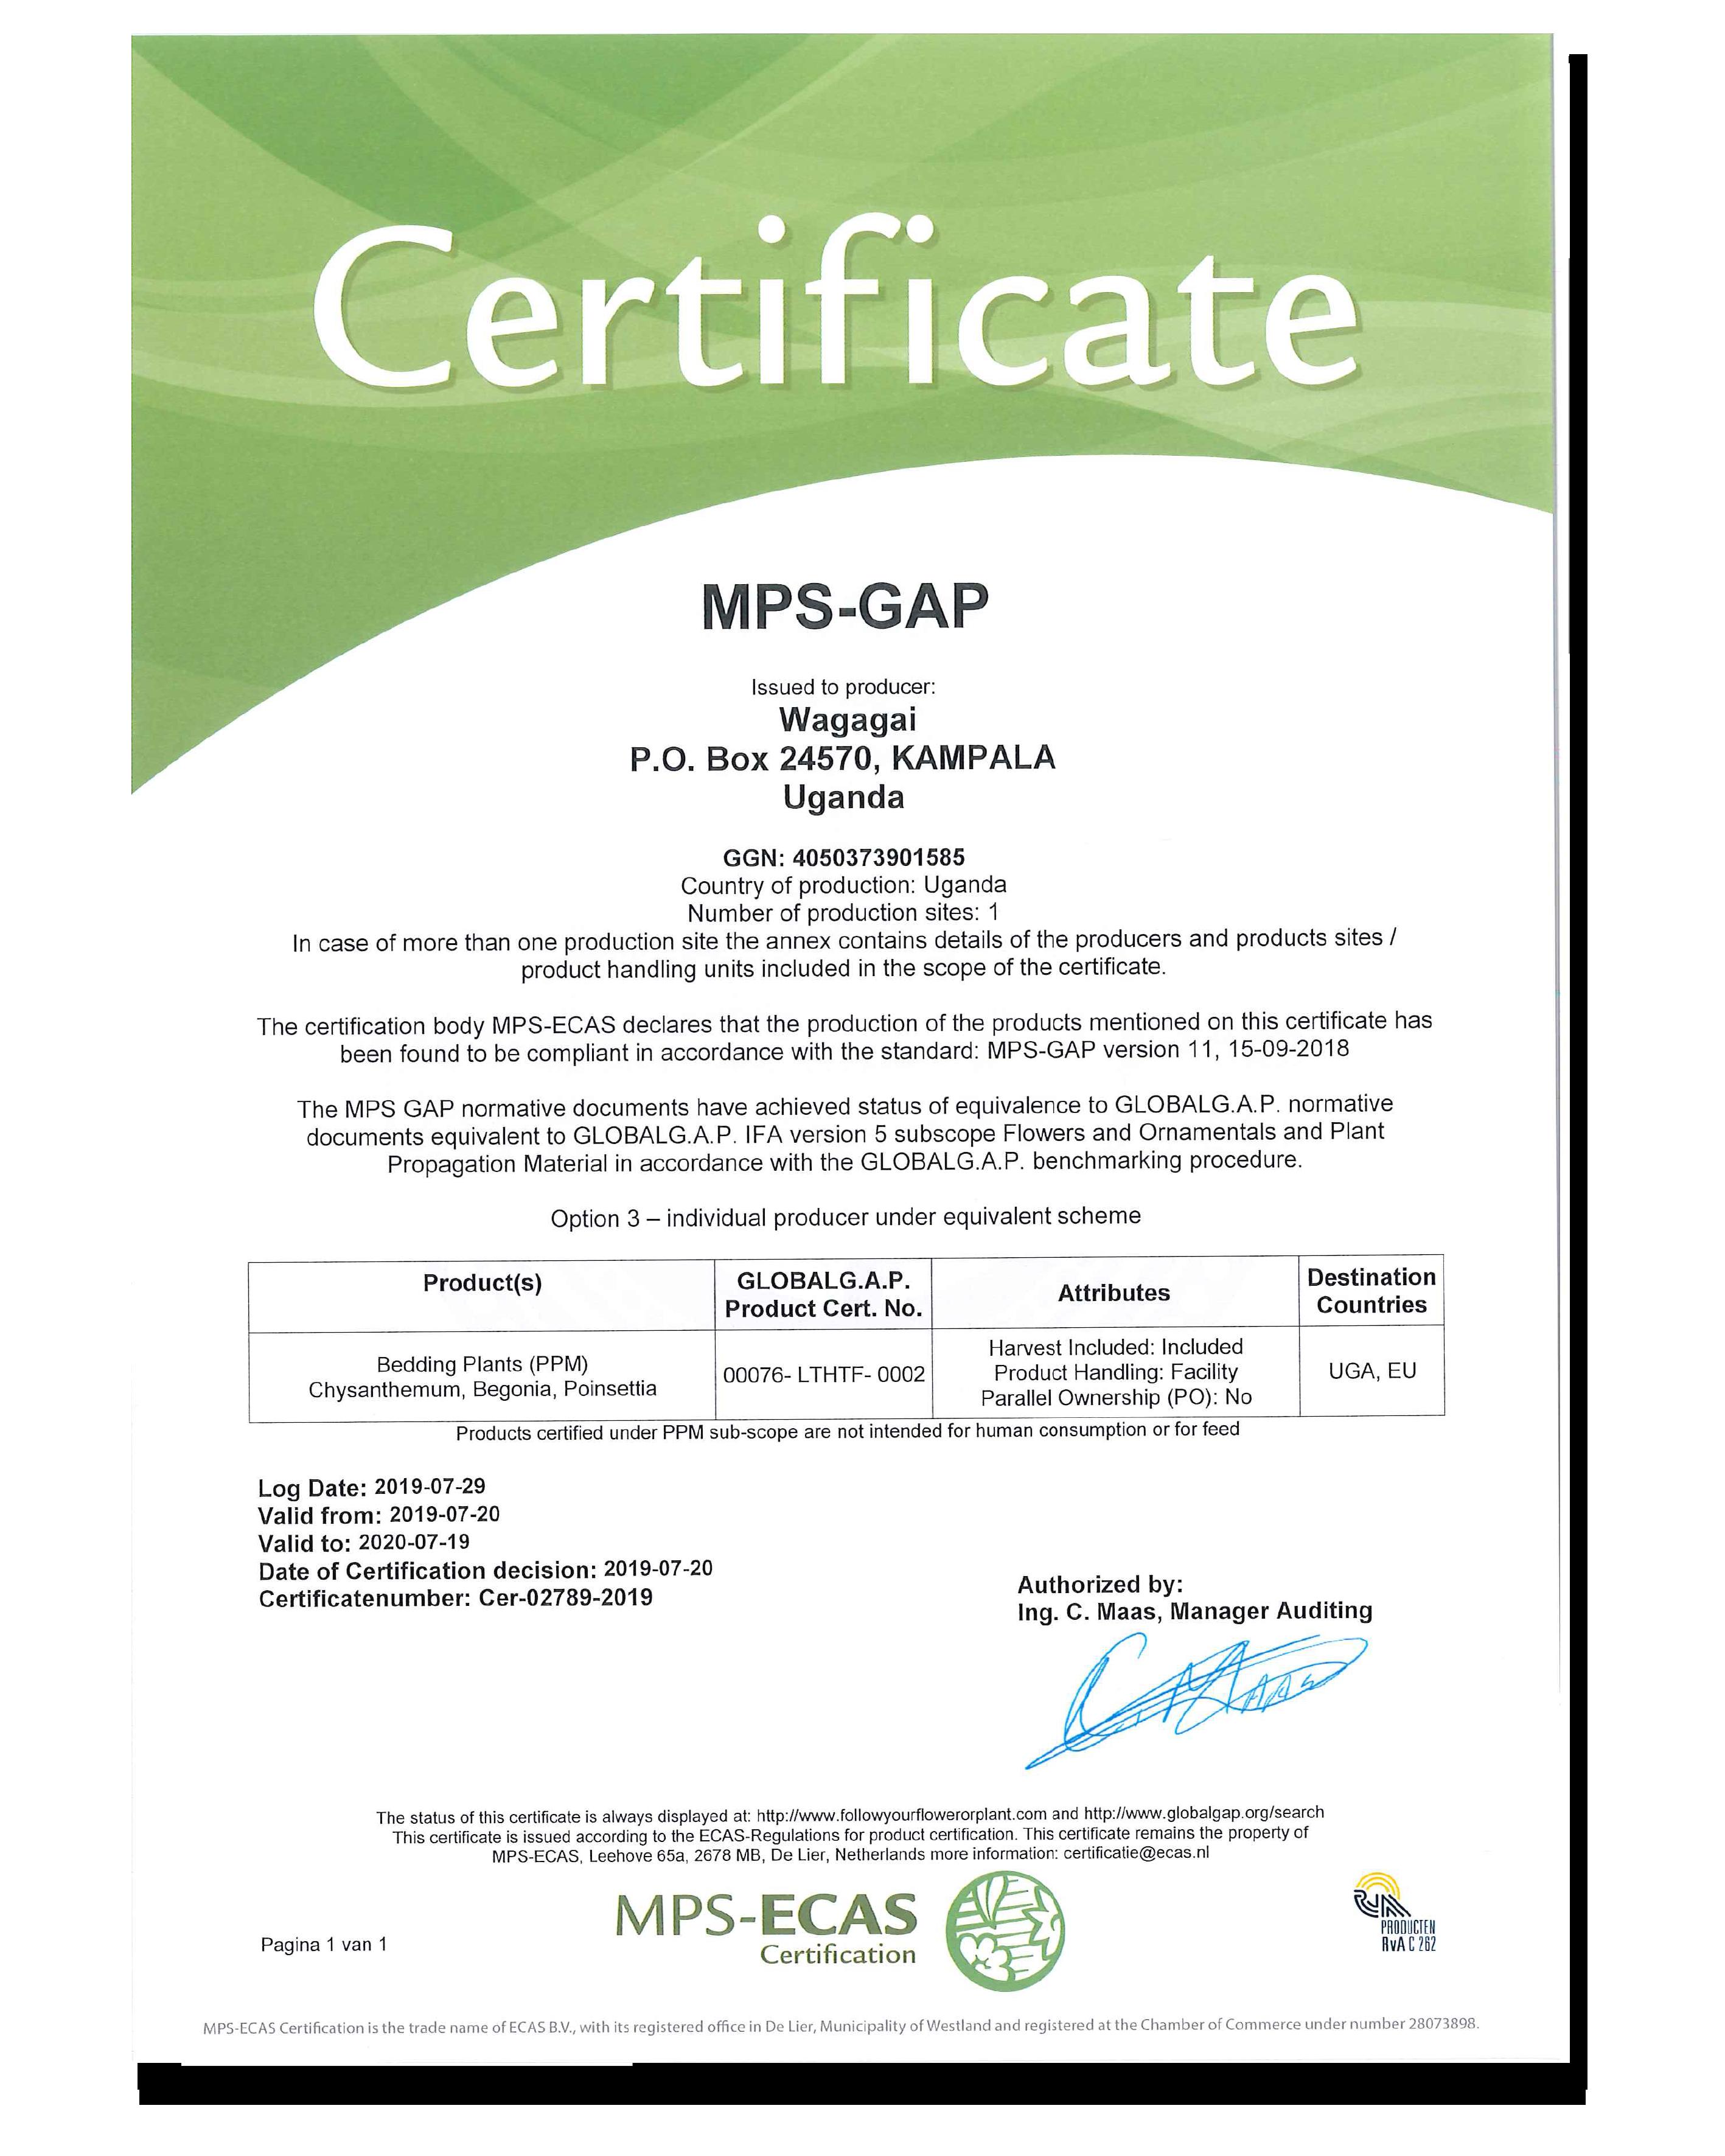 MPS-GAP Wagagai Ltd.